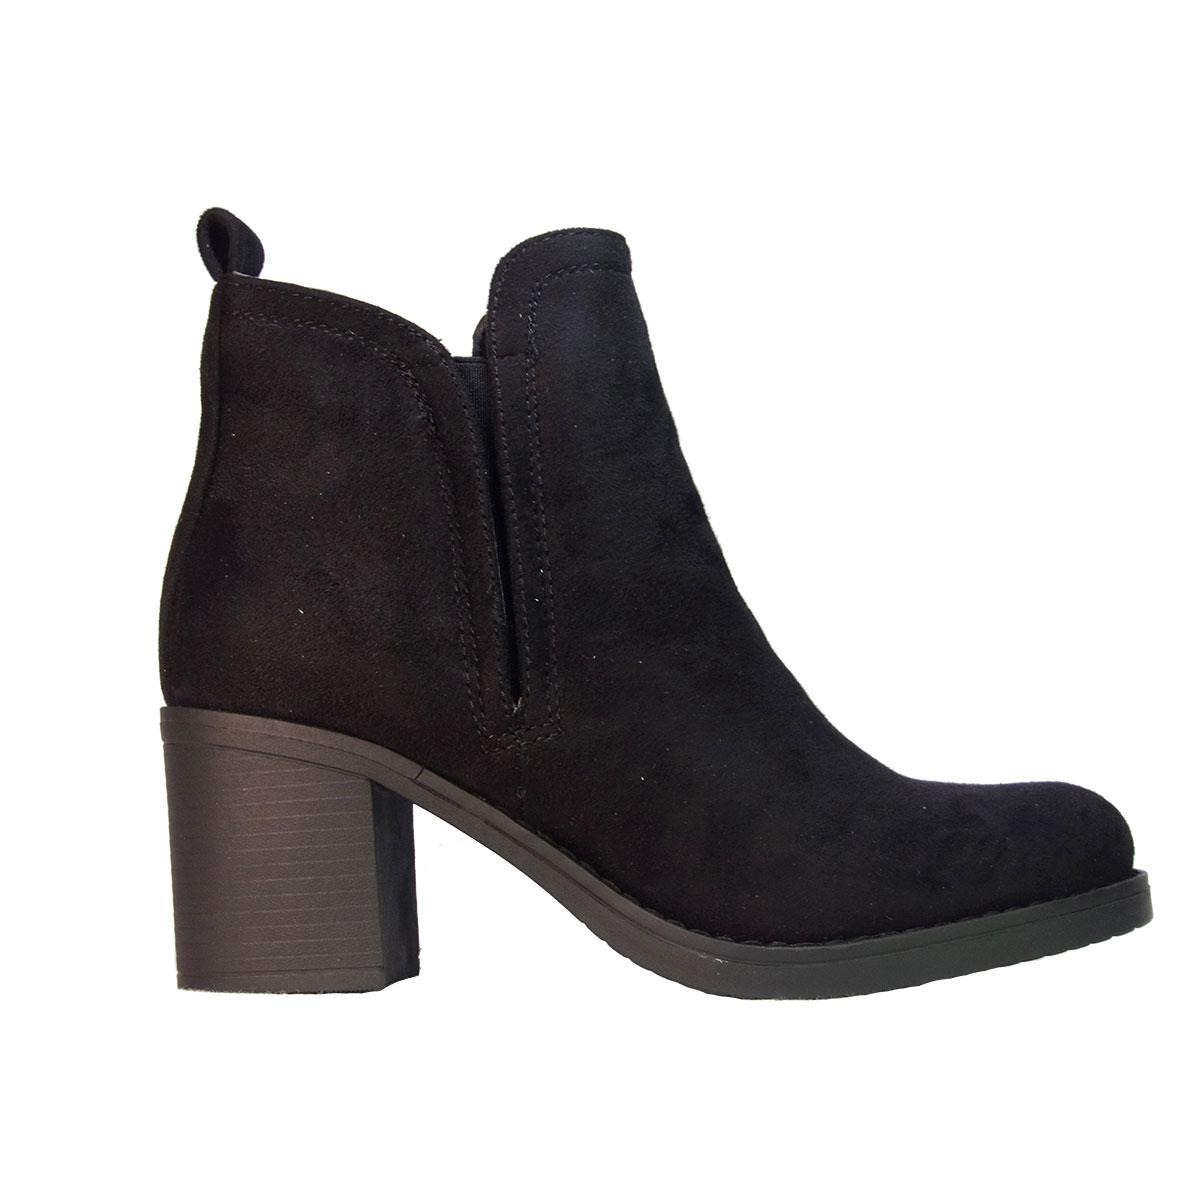 ILoveMyShoes 8903 Γυναικεία Μποτάκια Χοντρό Τακούνι Suede Μαύρο ... e6e6ddf5bba